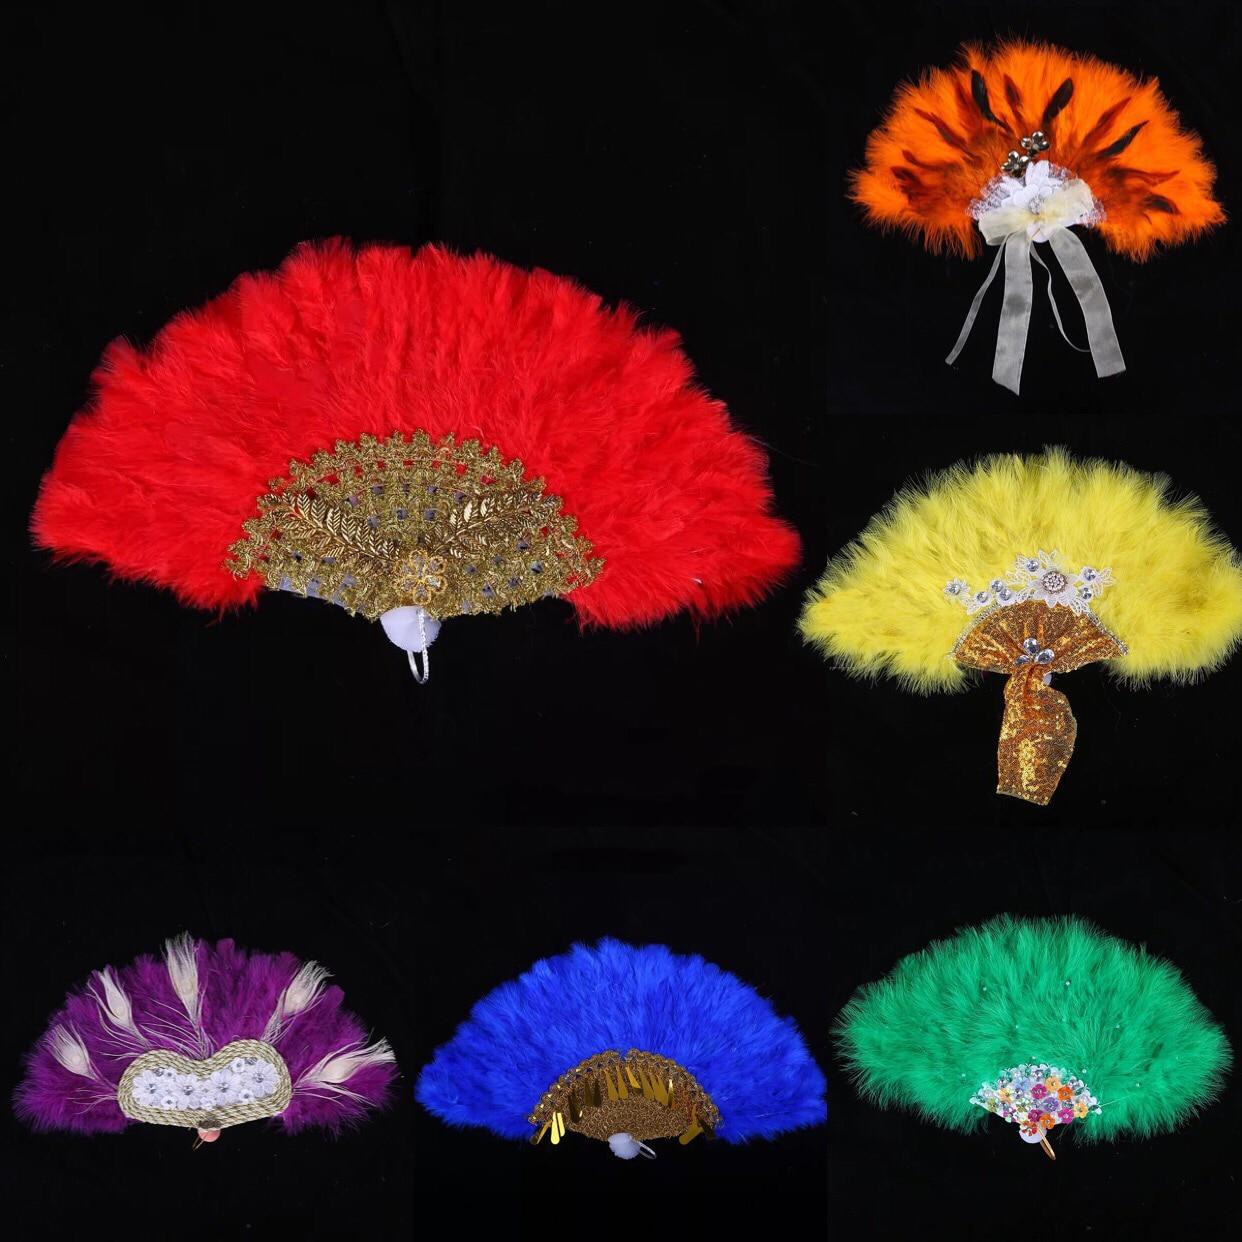 Wedding Custom Hand Fan With Pearl Lace Feather Hand Fan Handmade Hand Held Photo Props Abanicos Para Boda Wedding Favors Decor